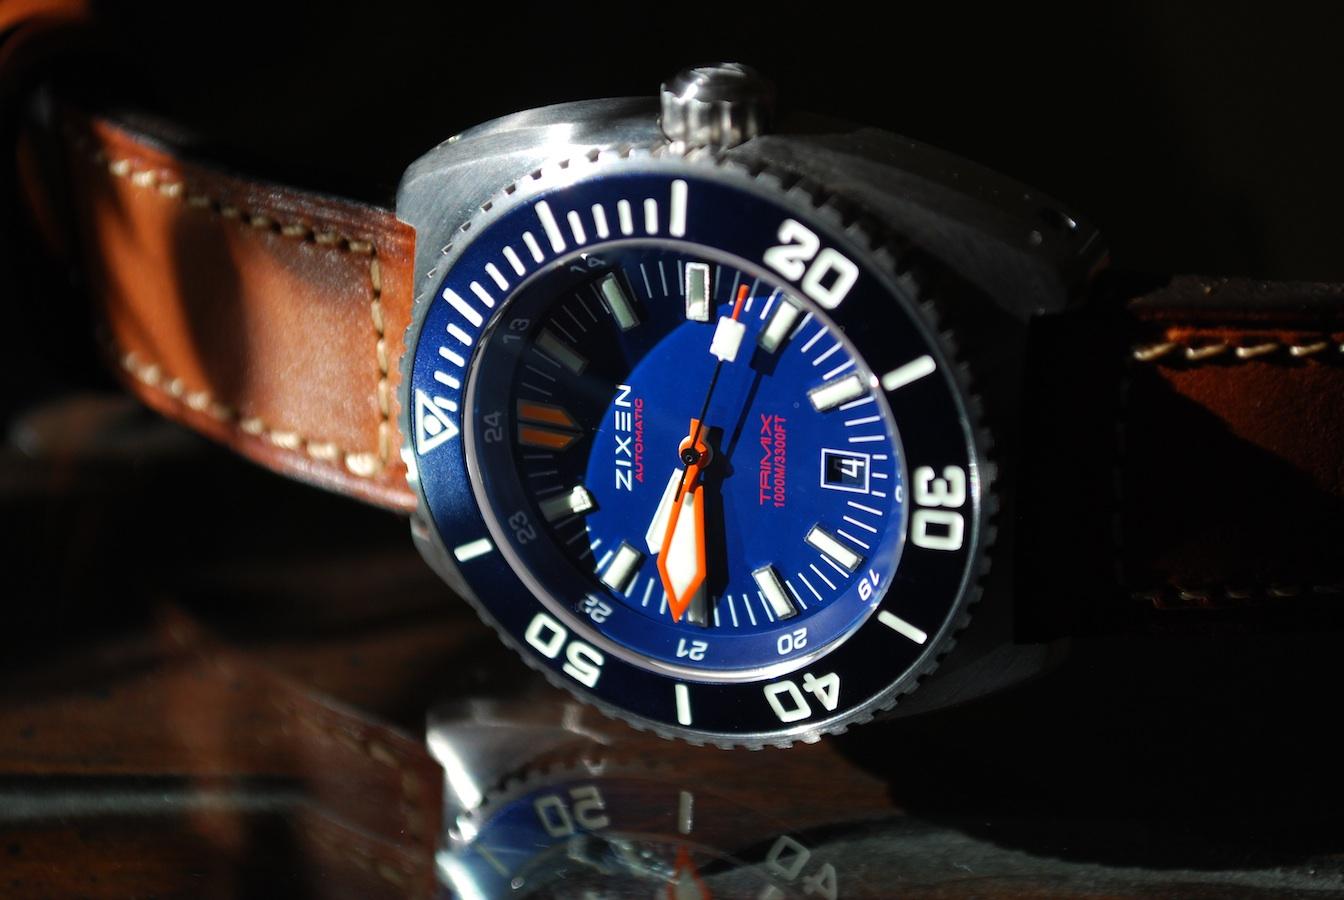 Name:  1211587d1378314641-sold-sold-sold-zixen-trimix-blue-4-straps-including-dirk-leather-blue-isofran.jpg Views: 836 Size:  244.6 KB